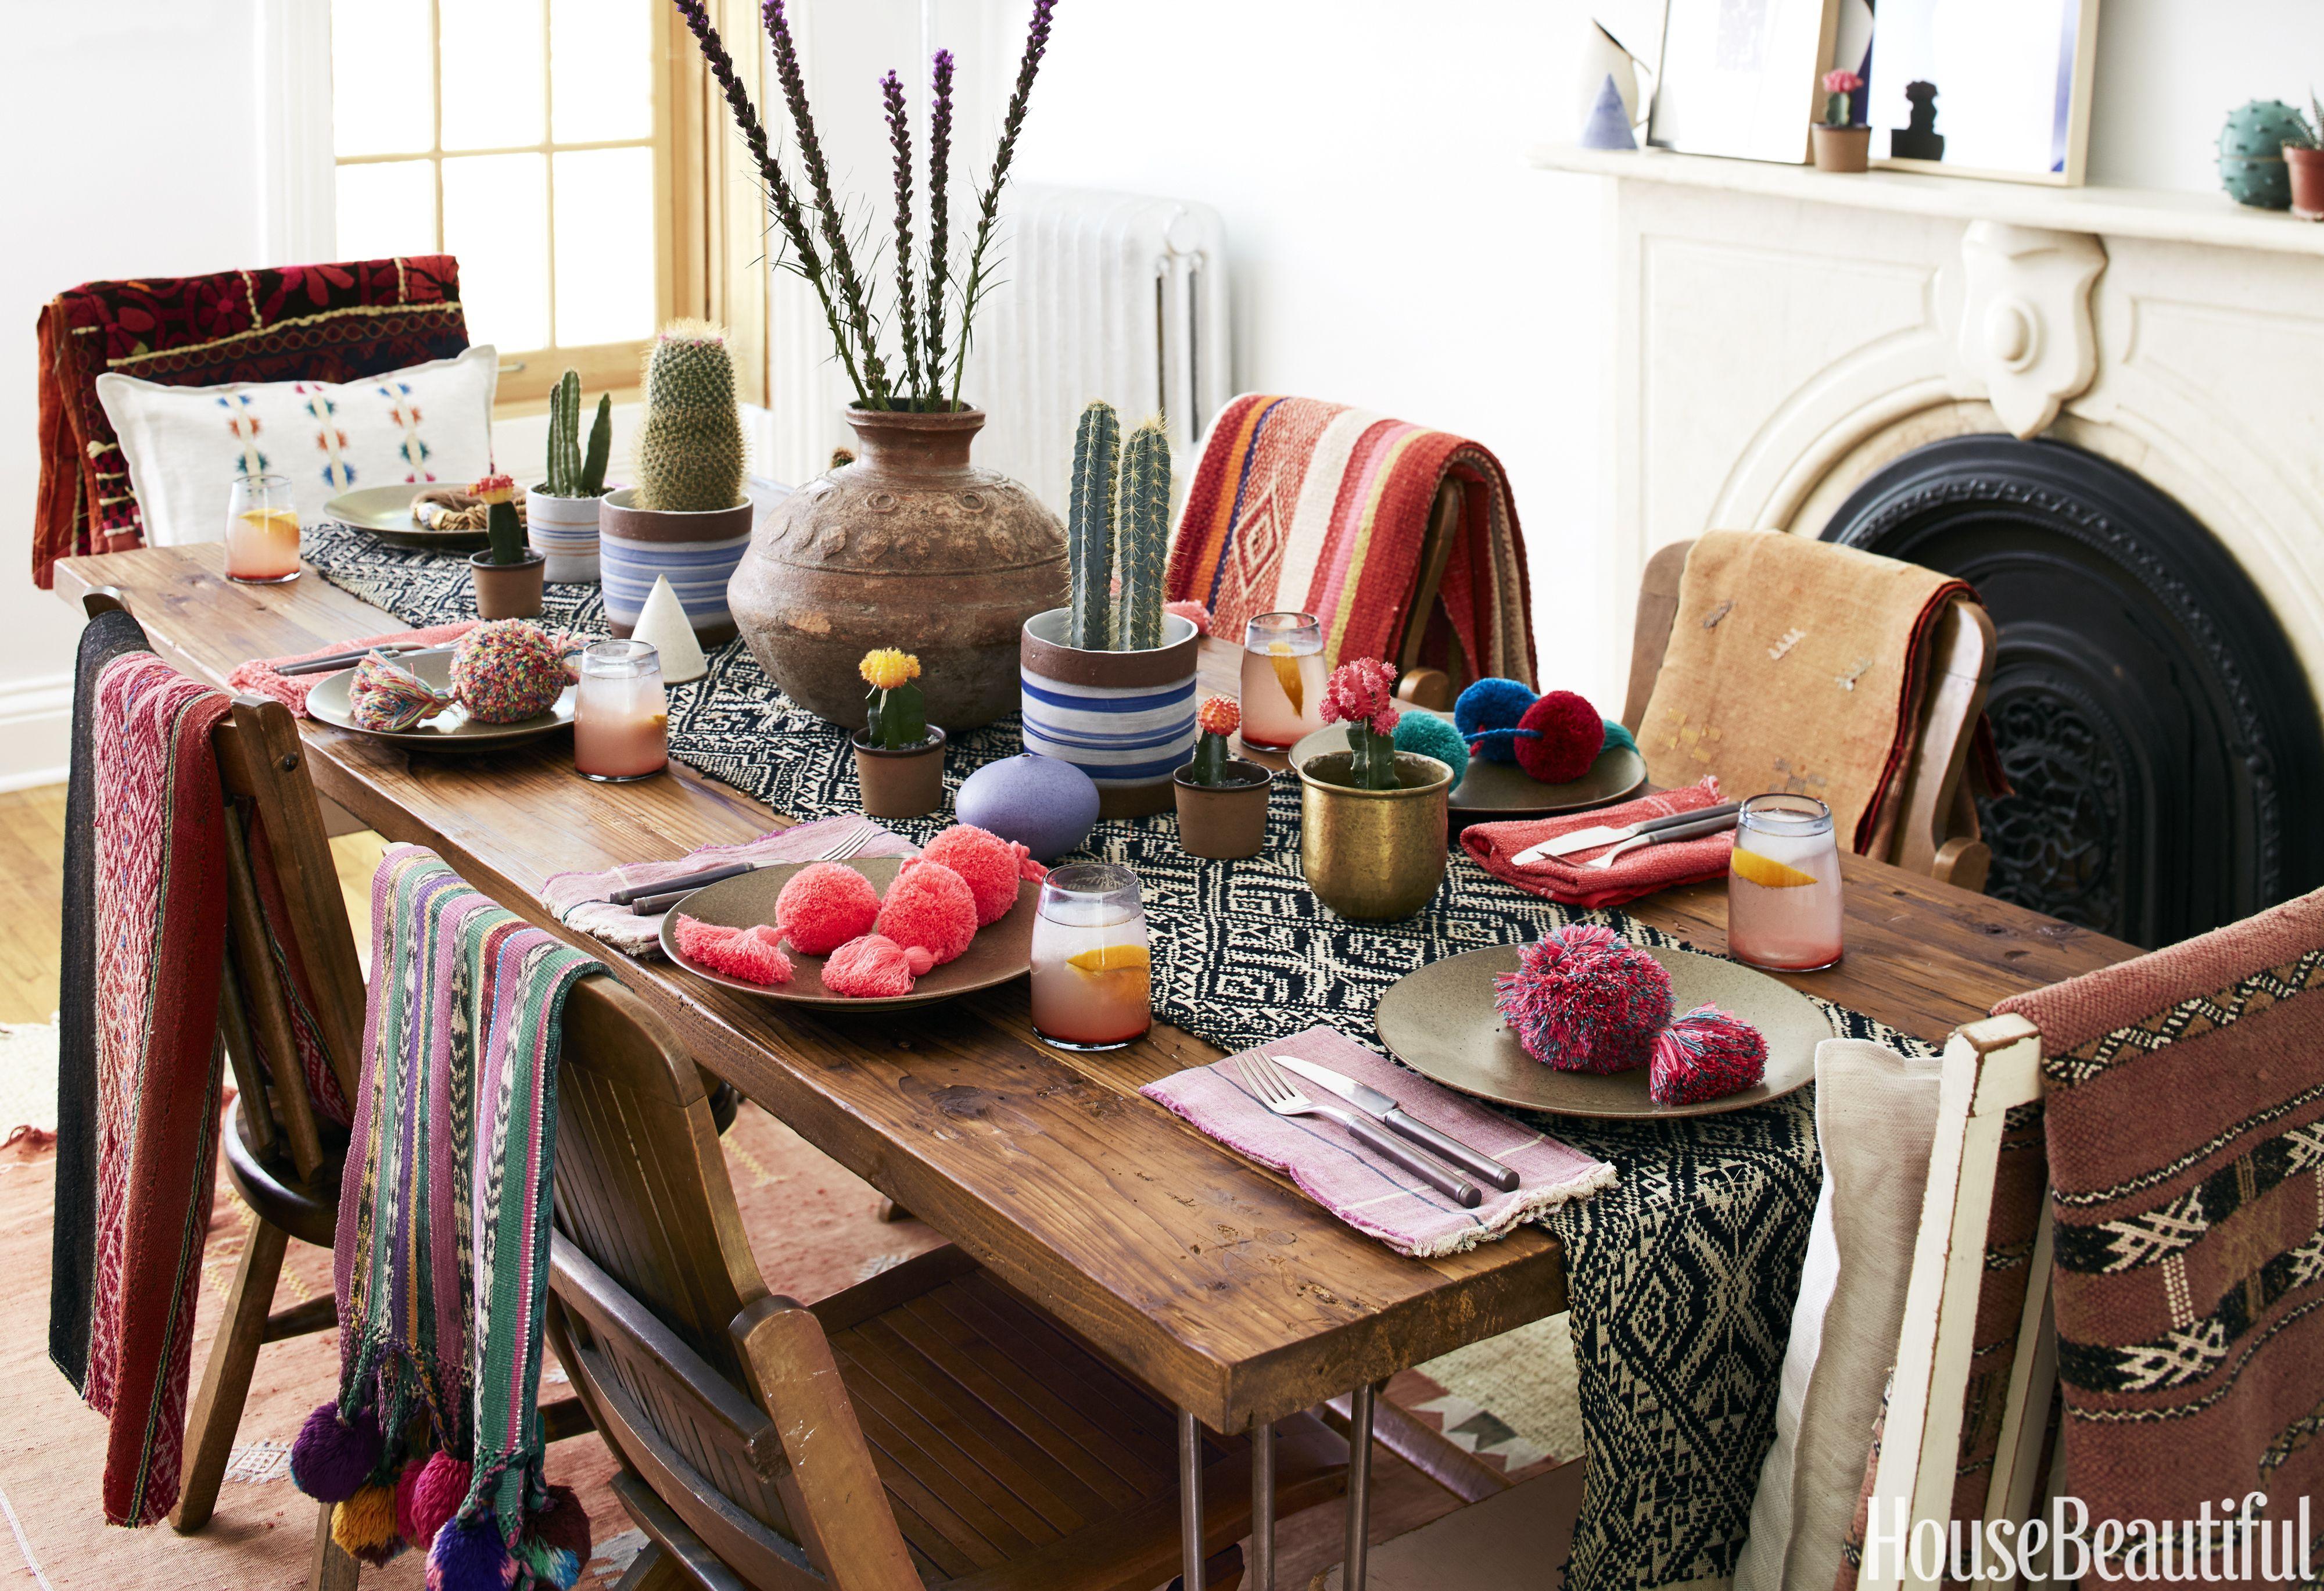 Table Decorating Ideas - Elegant Table Decor and Settings